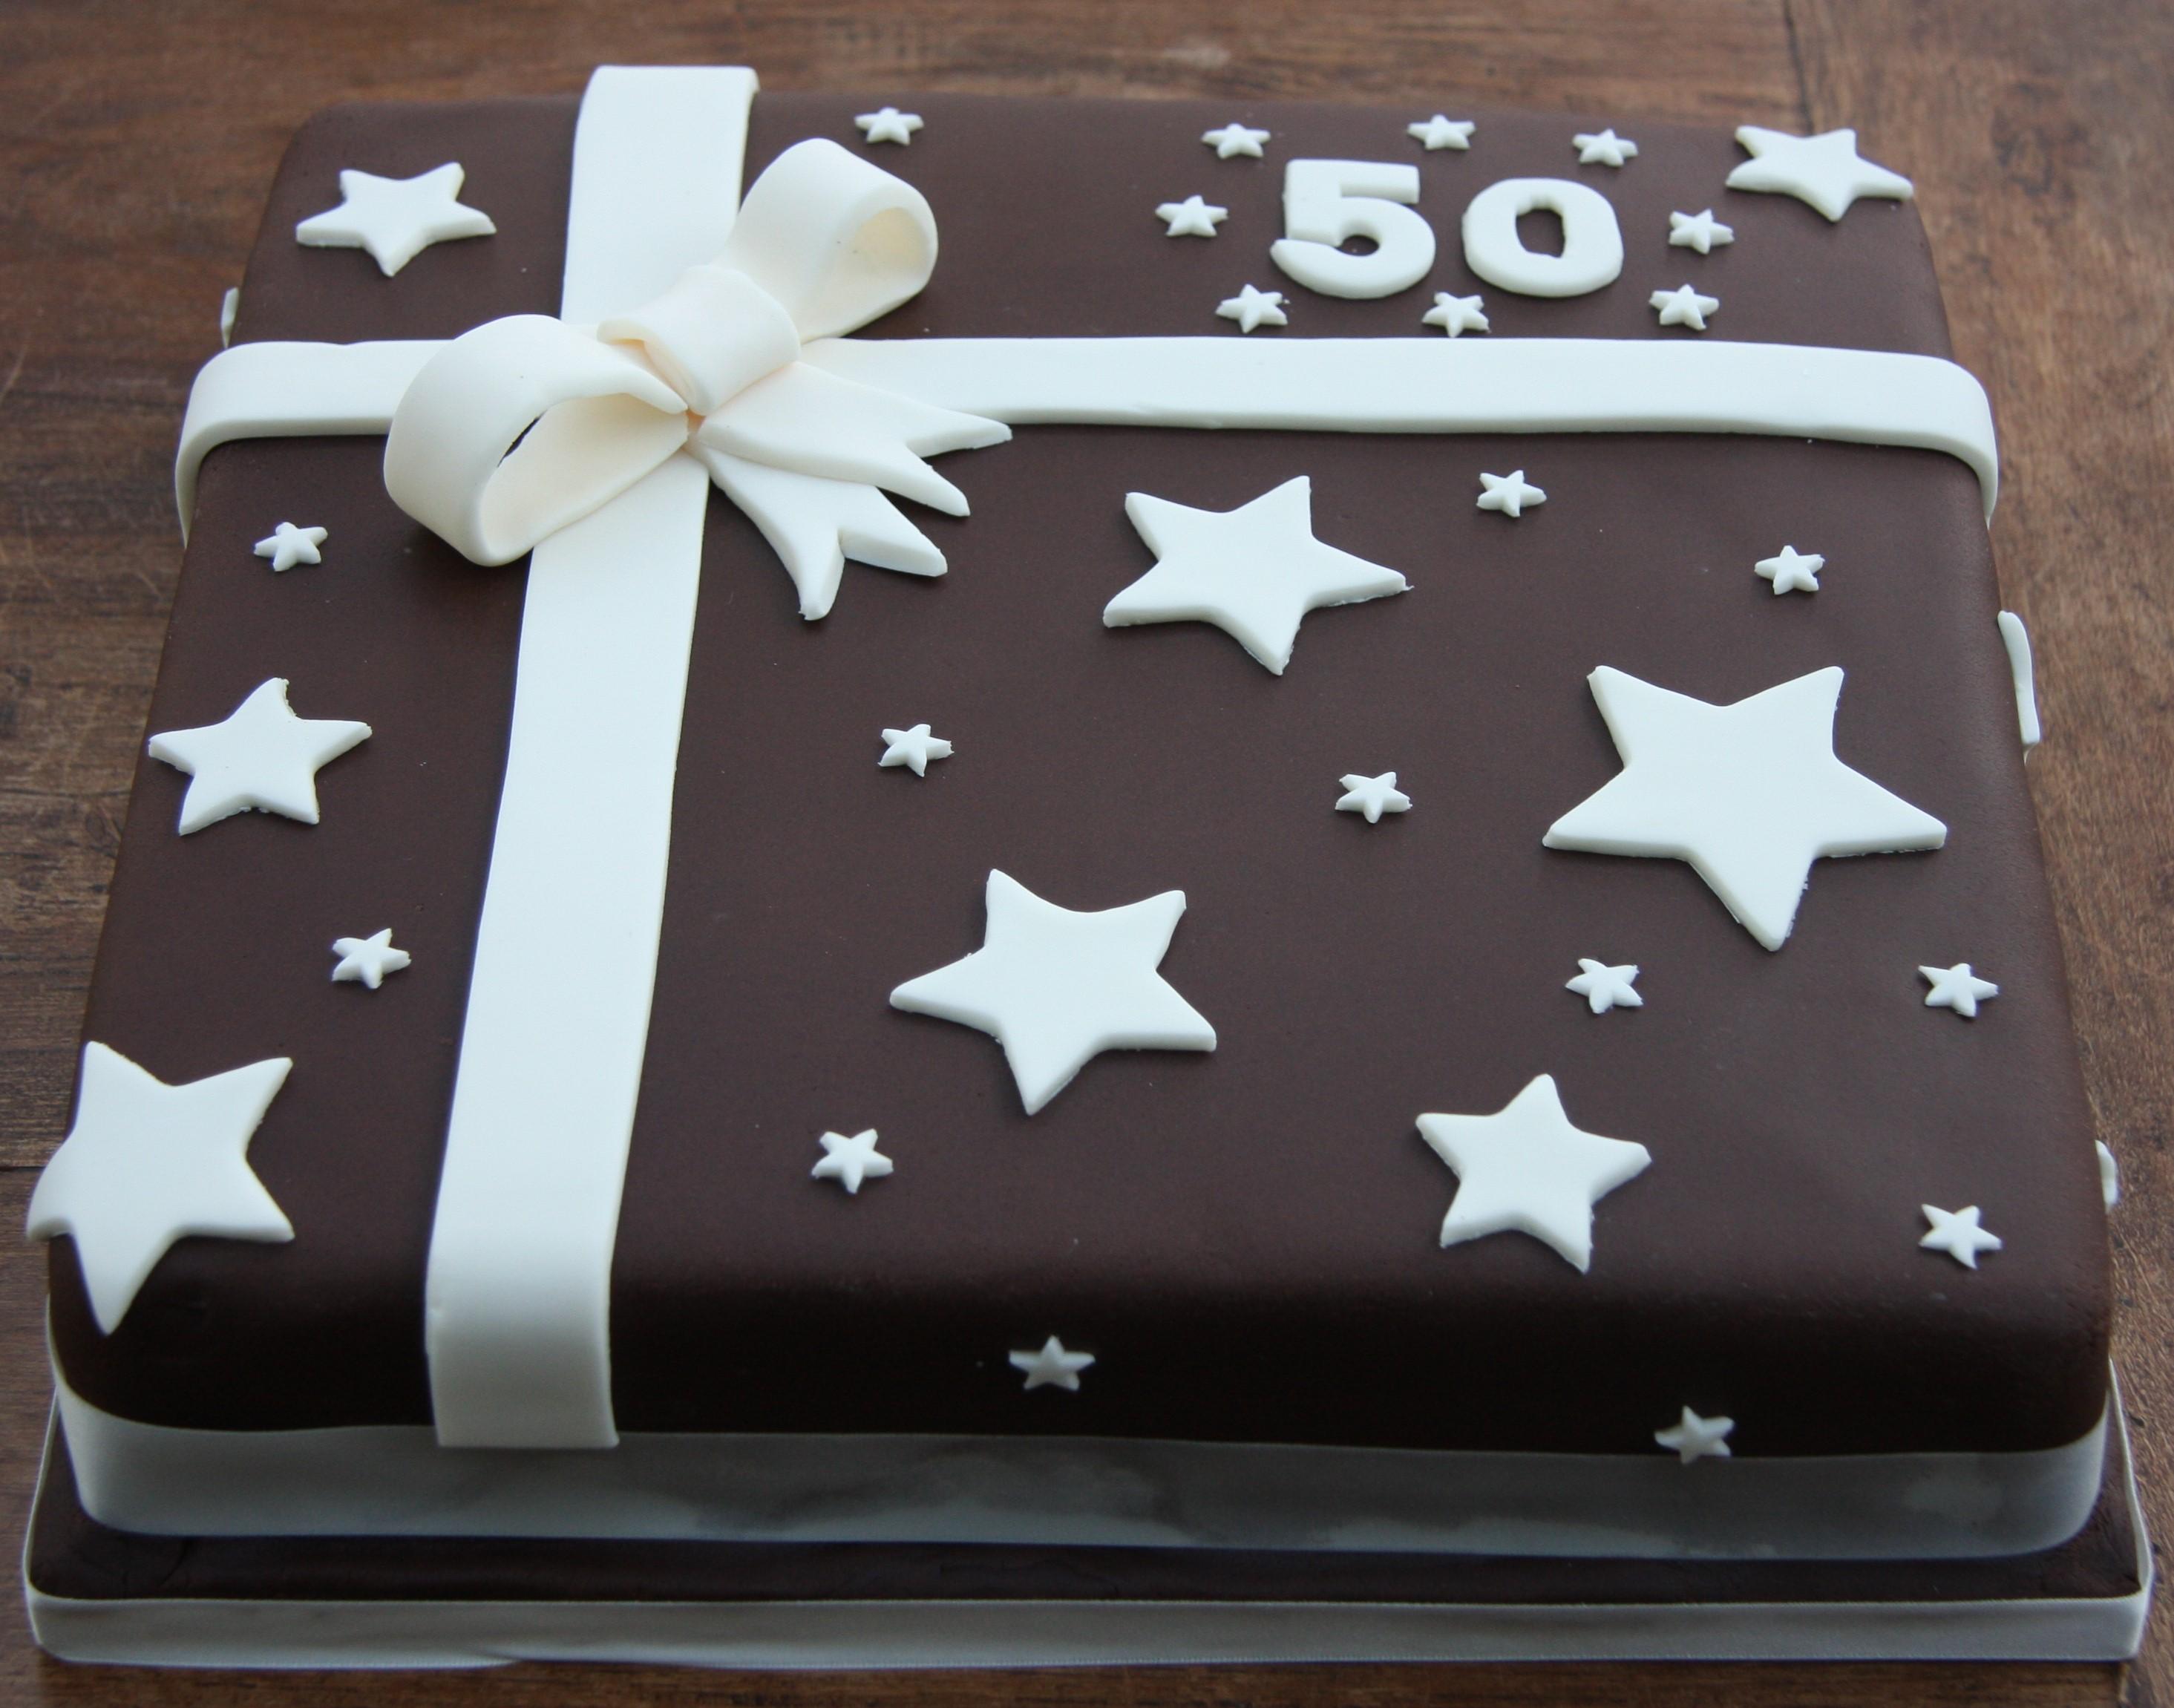 Birthday Present Cake 50th Lovinghomemade